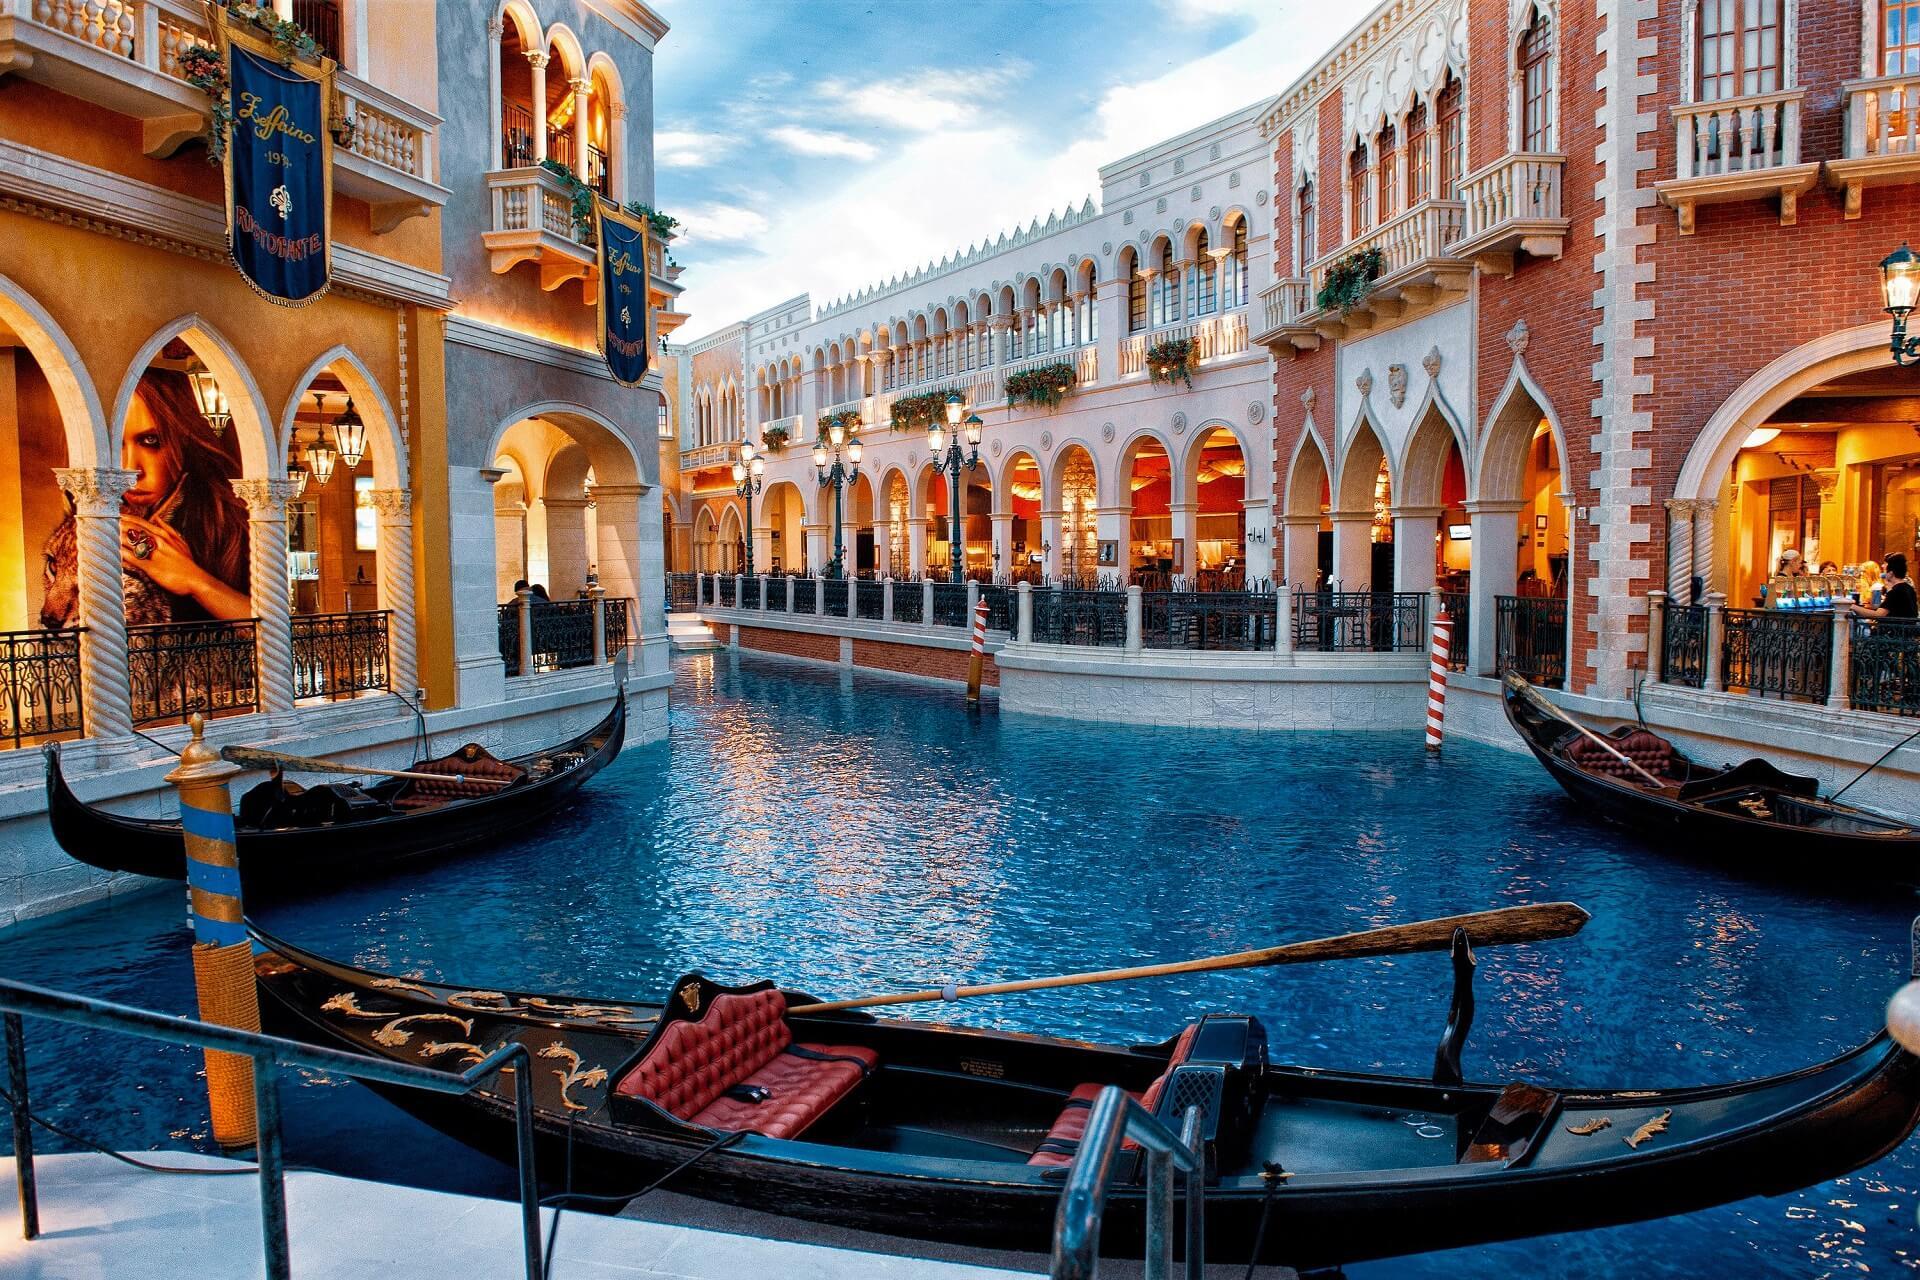 Venice - Cities Where Art Lives